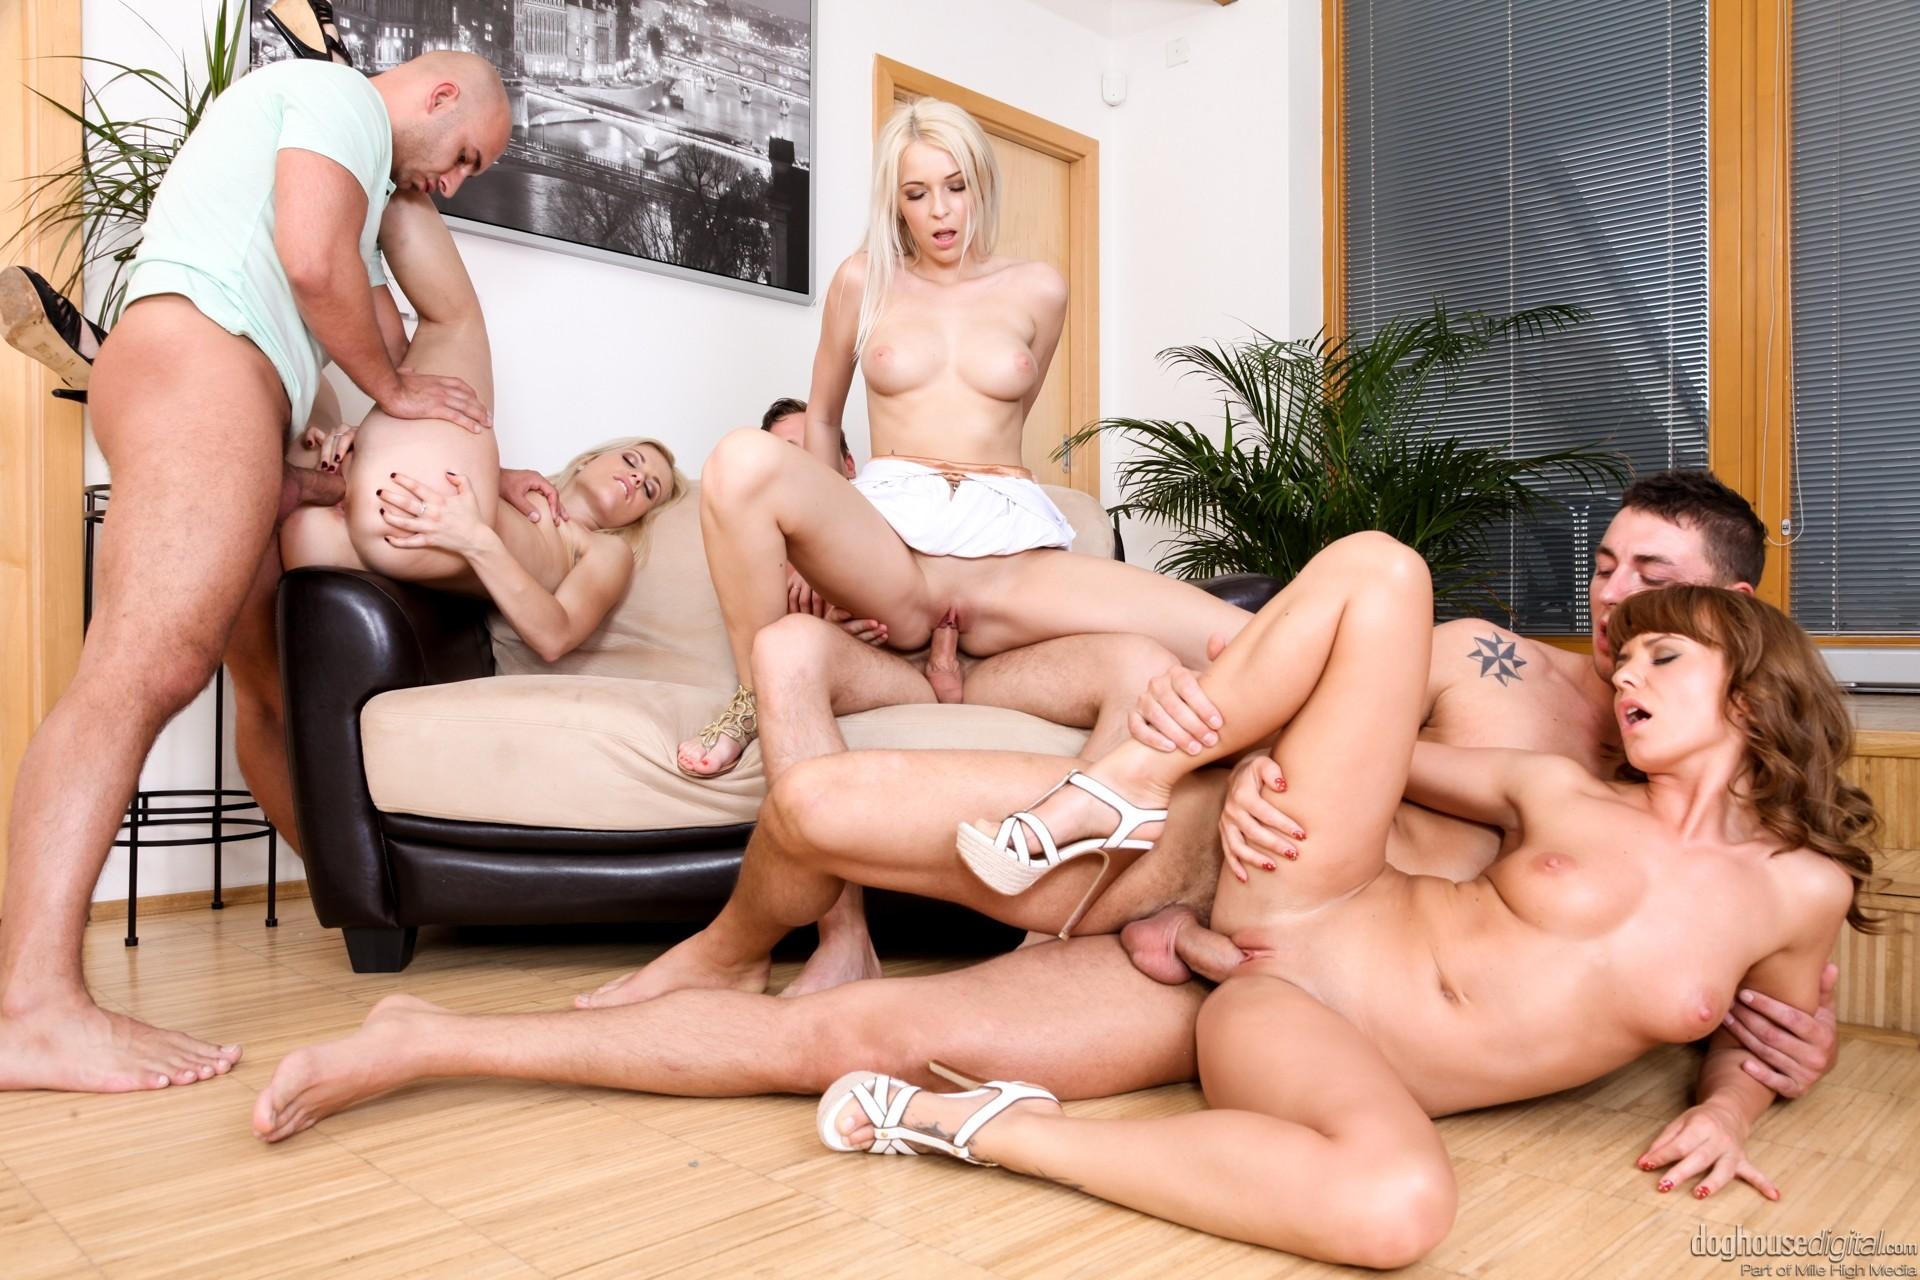 White foursome orgy swinger sex free bikini sexy wallpaper